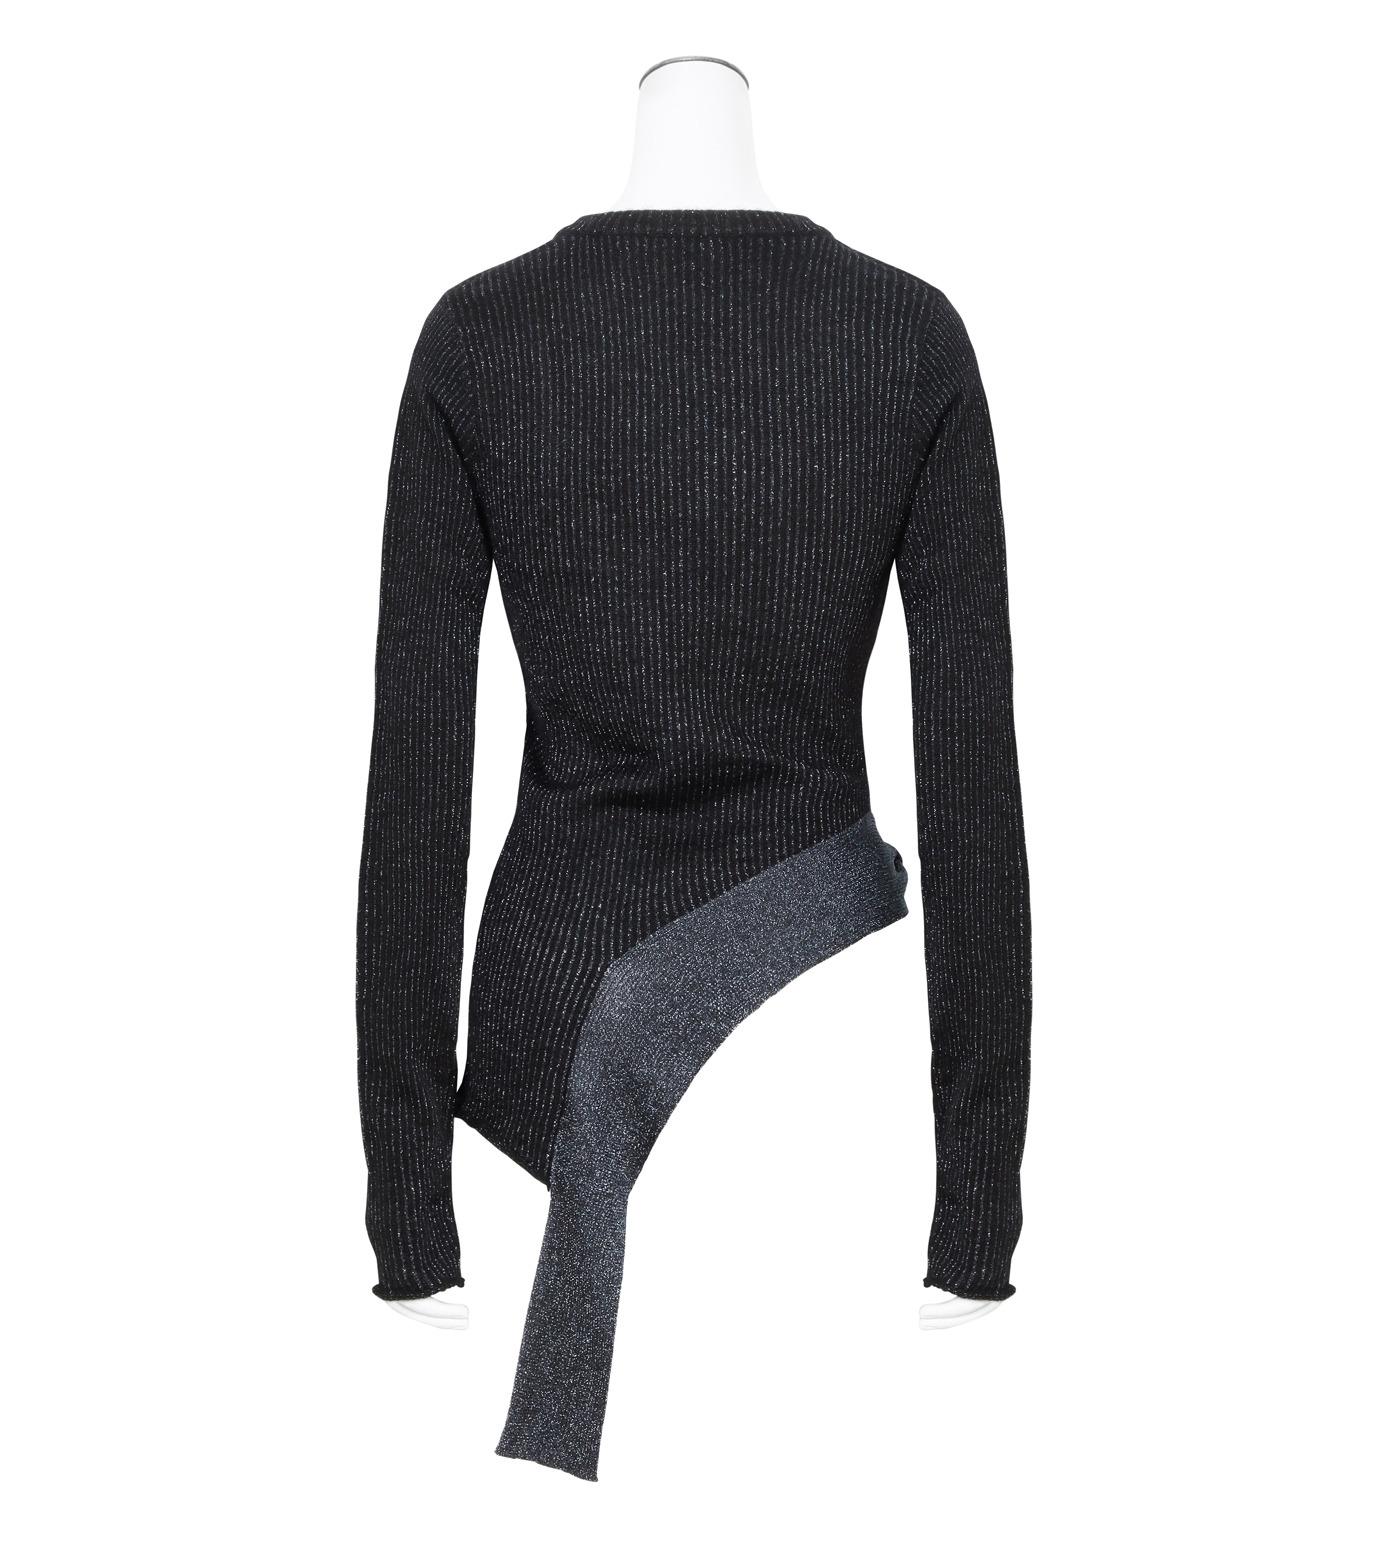 3.1 Phillip Lim(スリーワン フィリップリム)のLurex Tie Pullover-NAVY(ニット/knit)-H161-7745SLM-93 拡大詳細画像2